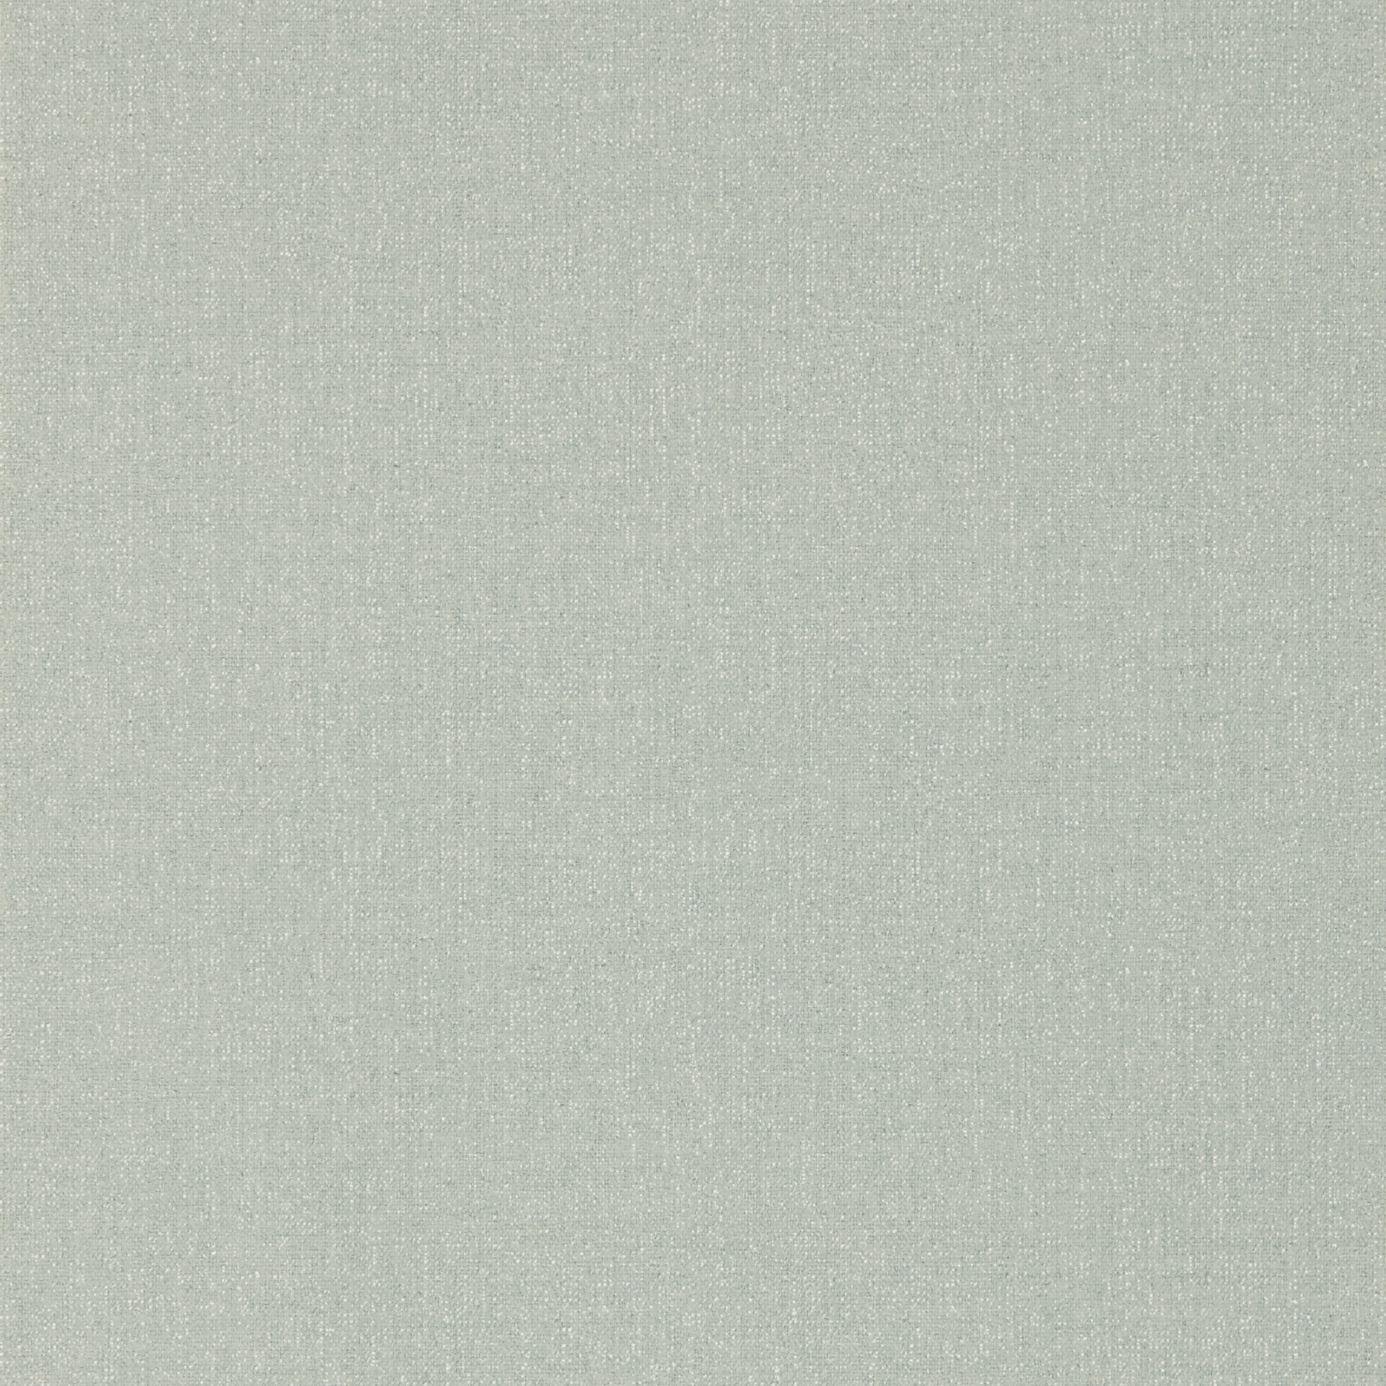 Soho Plain 215446